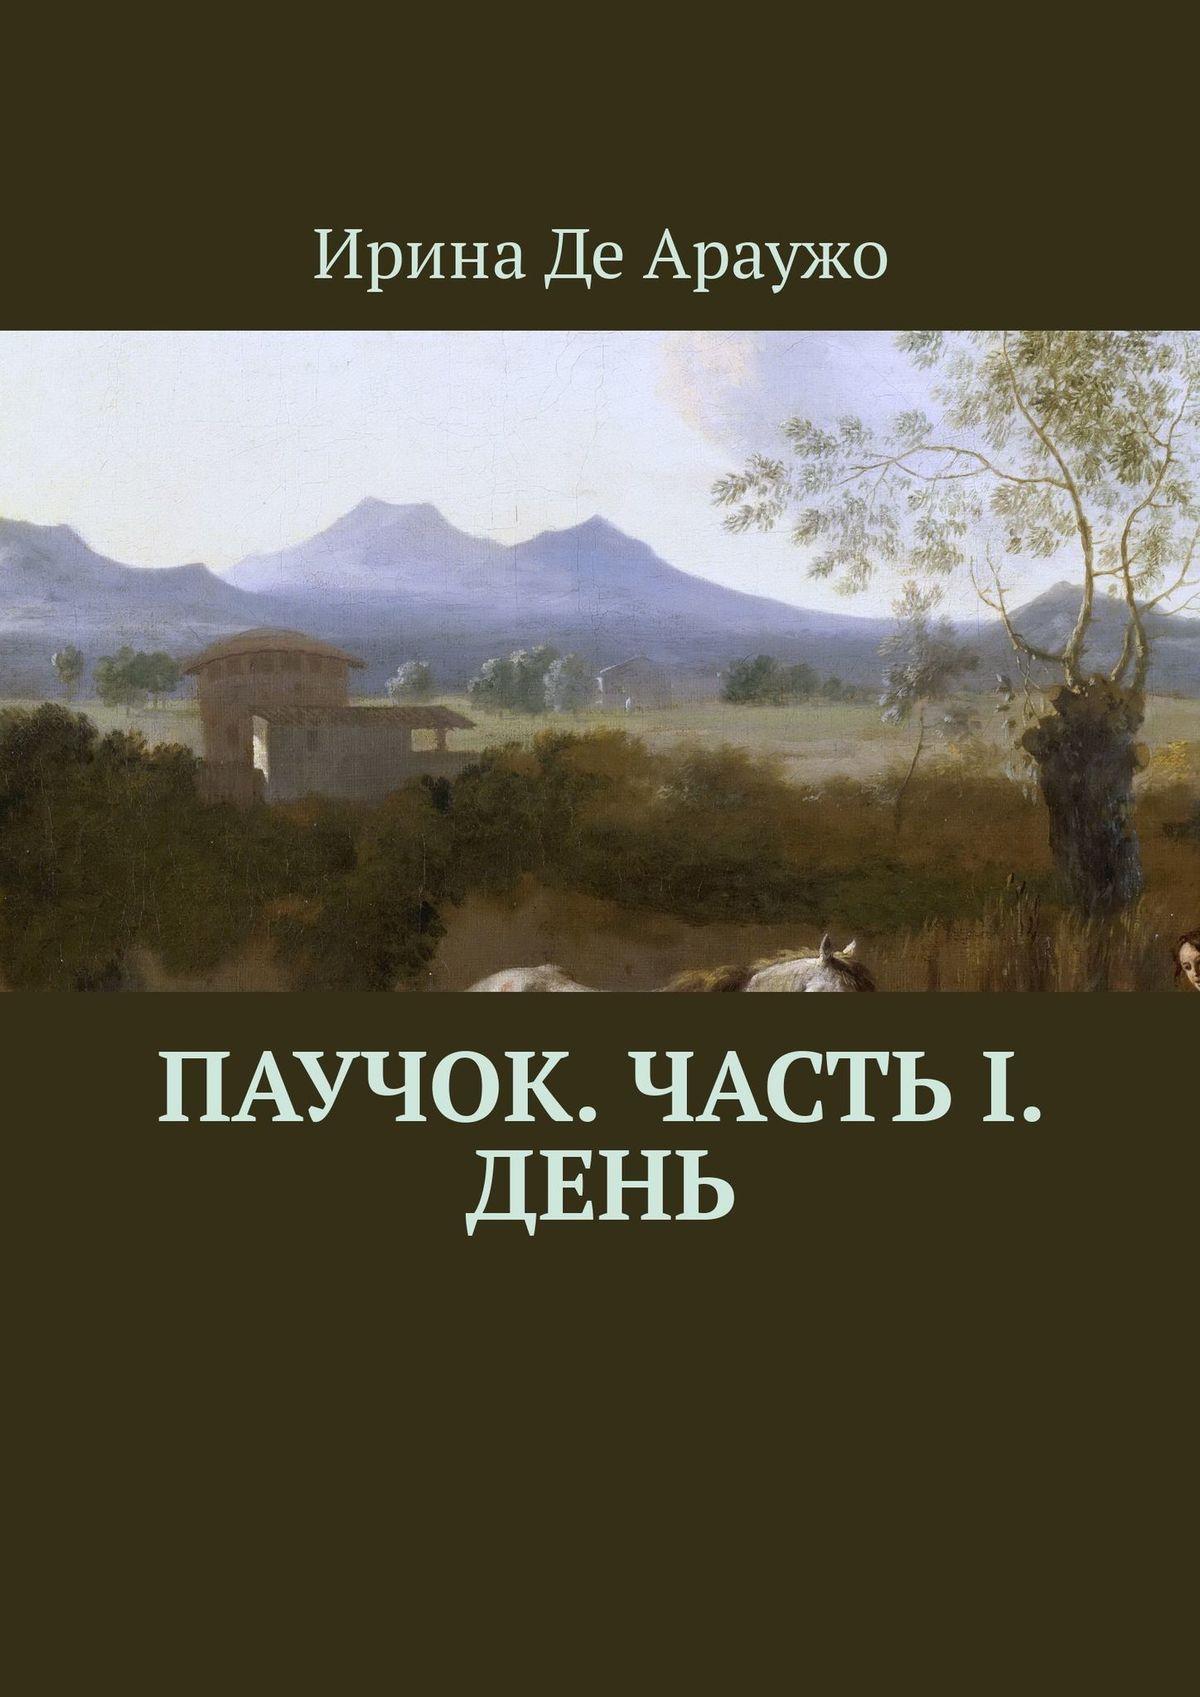 Ирина Де Араужо Паучок. Часть І. День